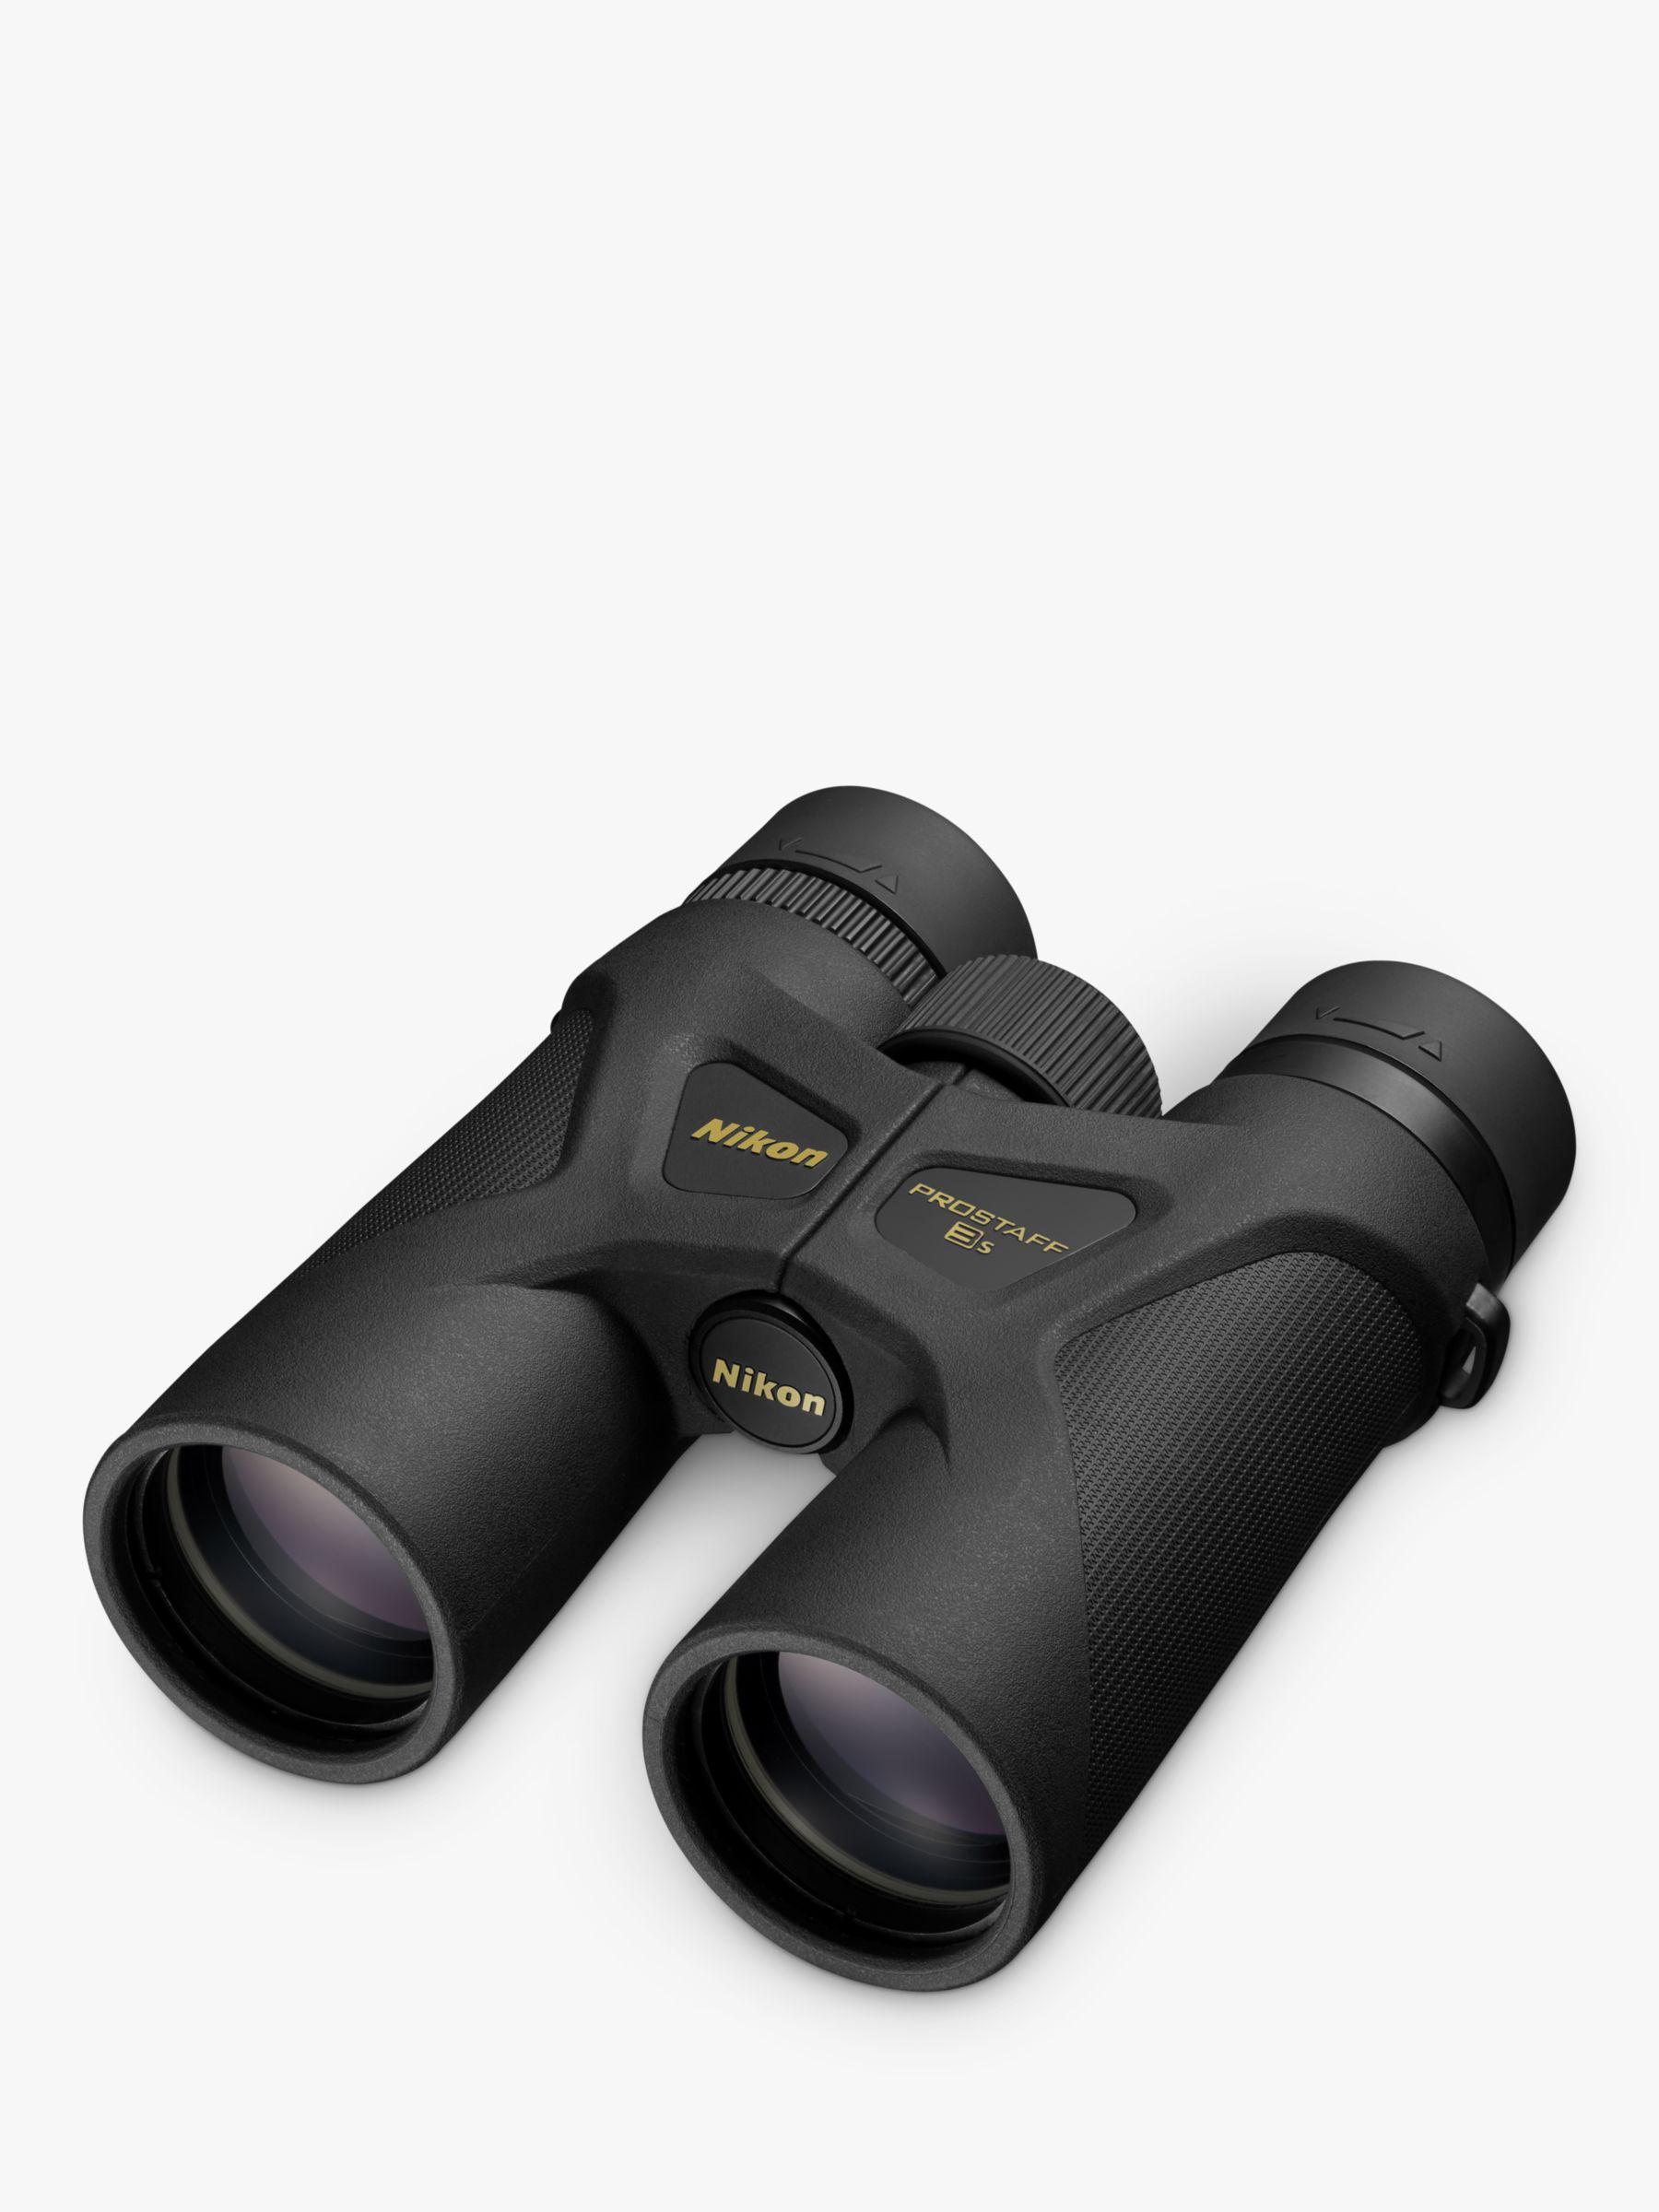 Nikon Nikon PROSTAFF 3S Binoculars, 10 x 42, Black